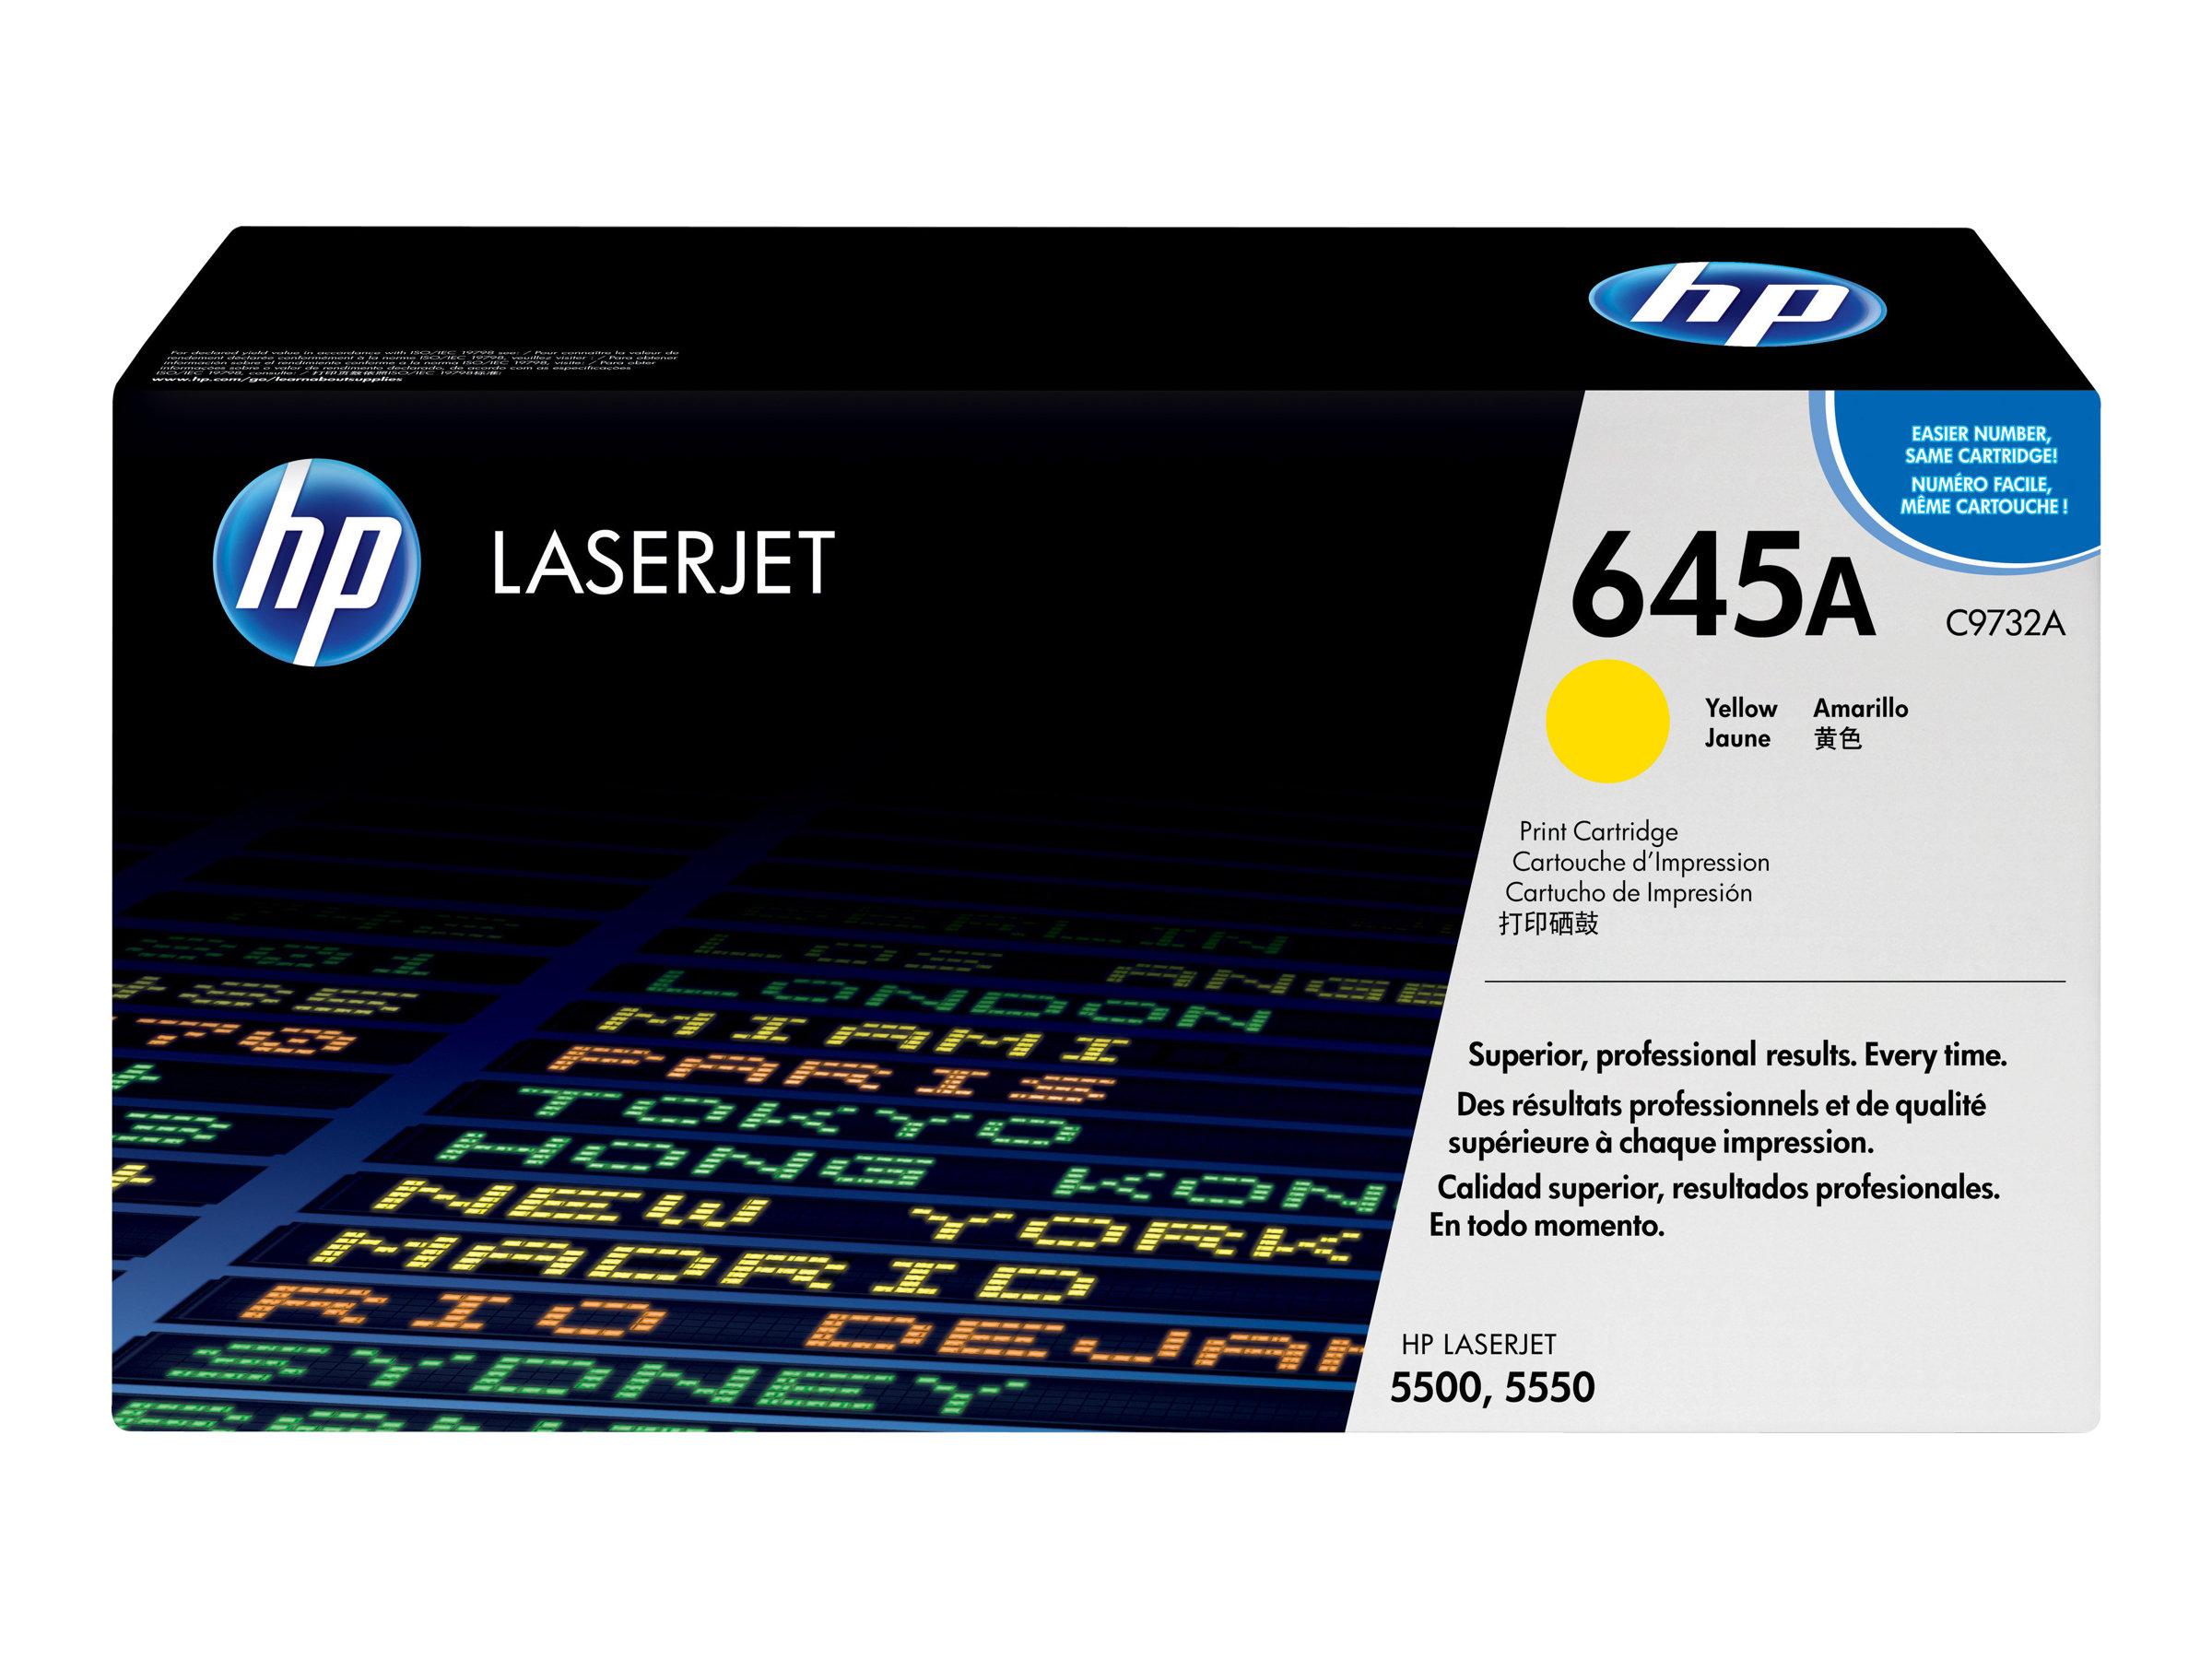 HP 645A - Gelb - Original - LaserJet - Tonerpatrone (C9732A) - für Color LaserJet 5500, 5550